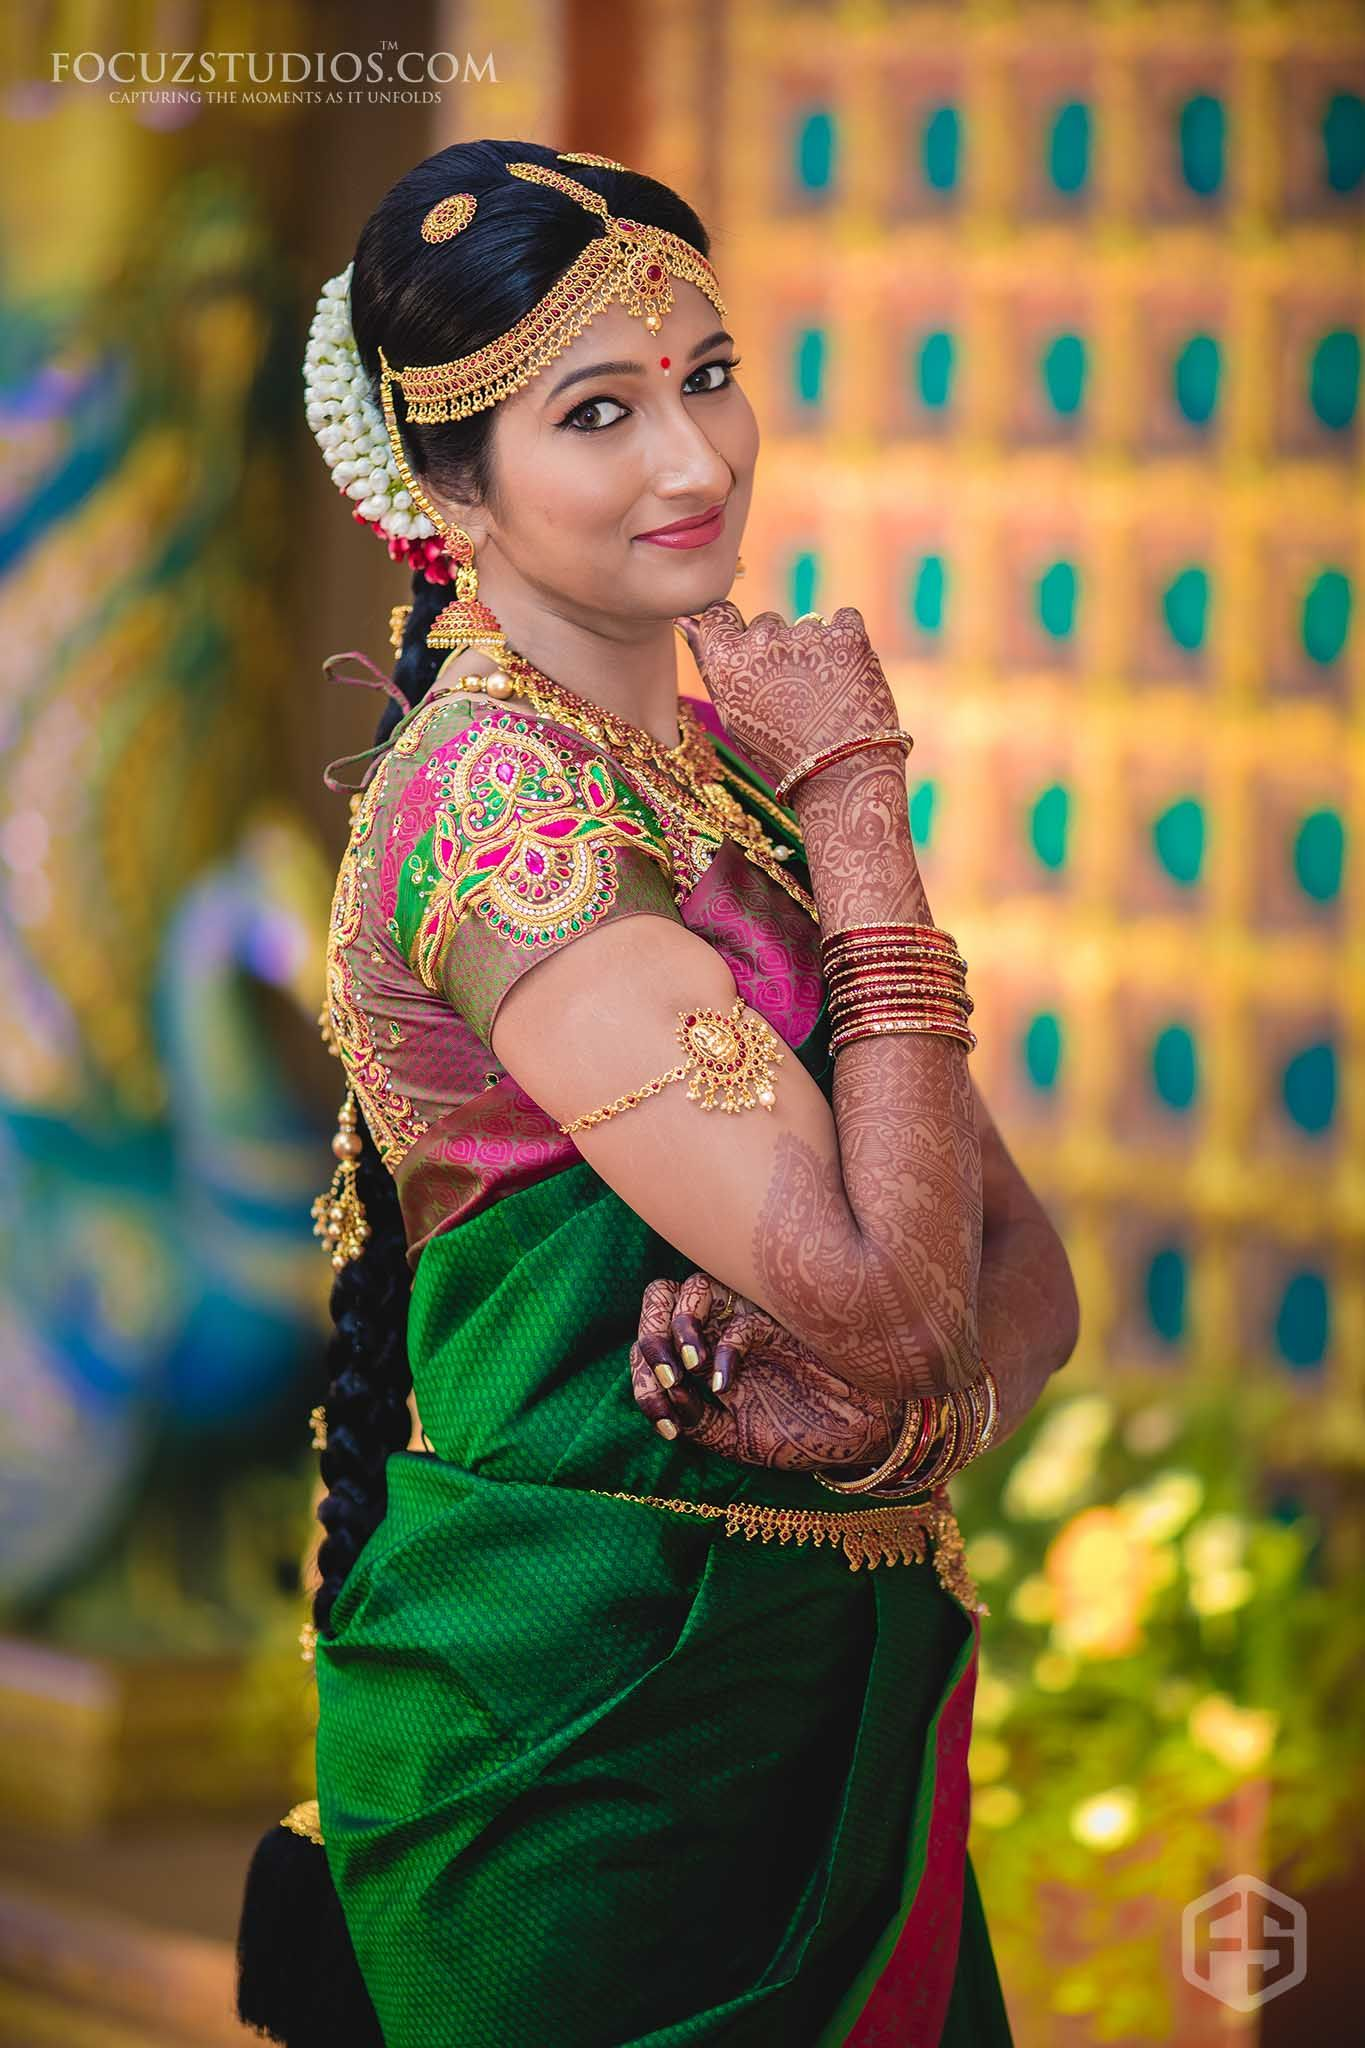 Tambrahm Wedding Photography Chennai | Indian wedding